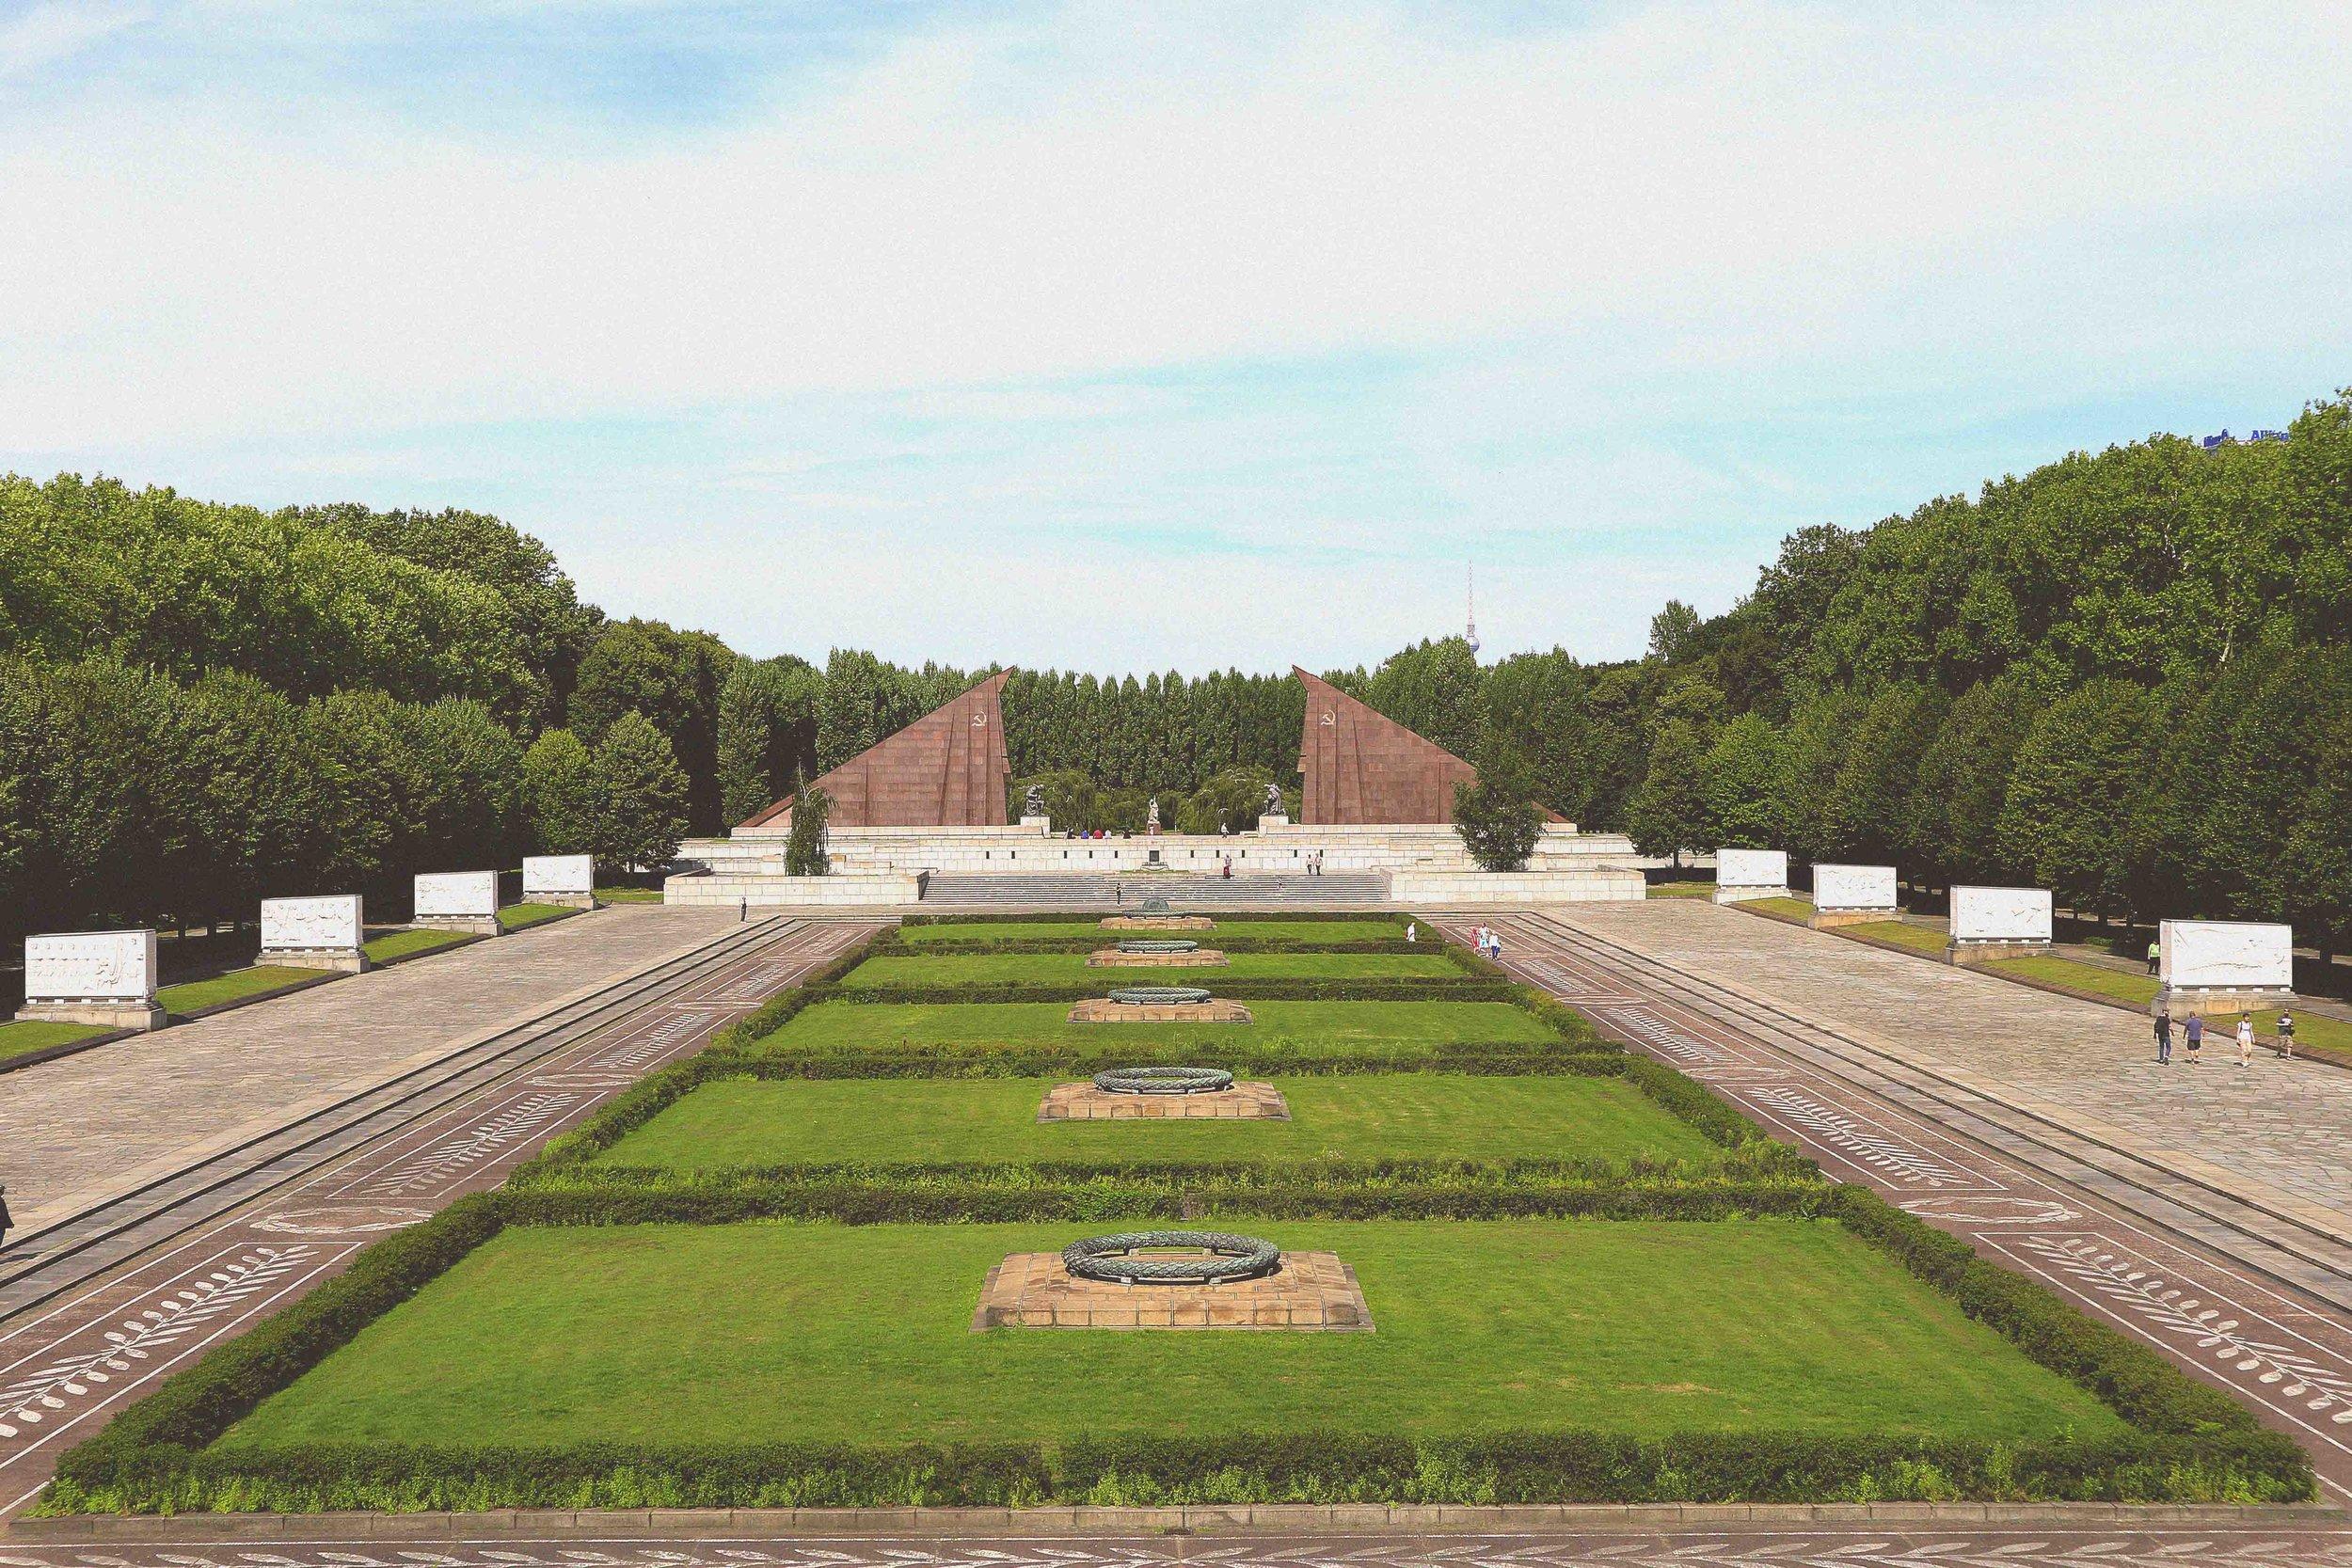 The Treptower Memorial